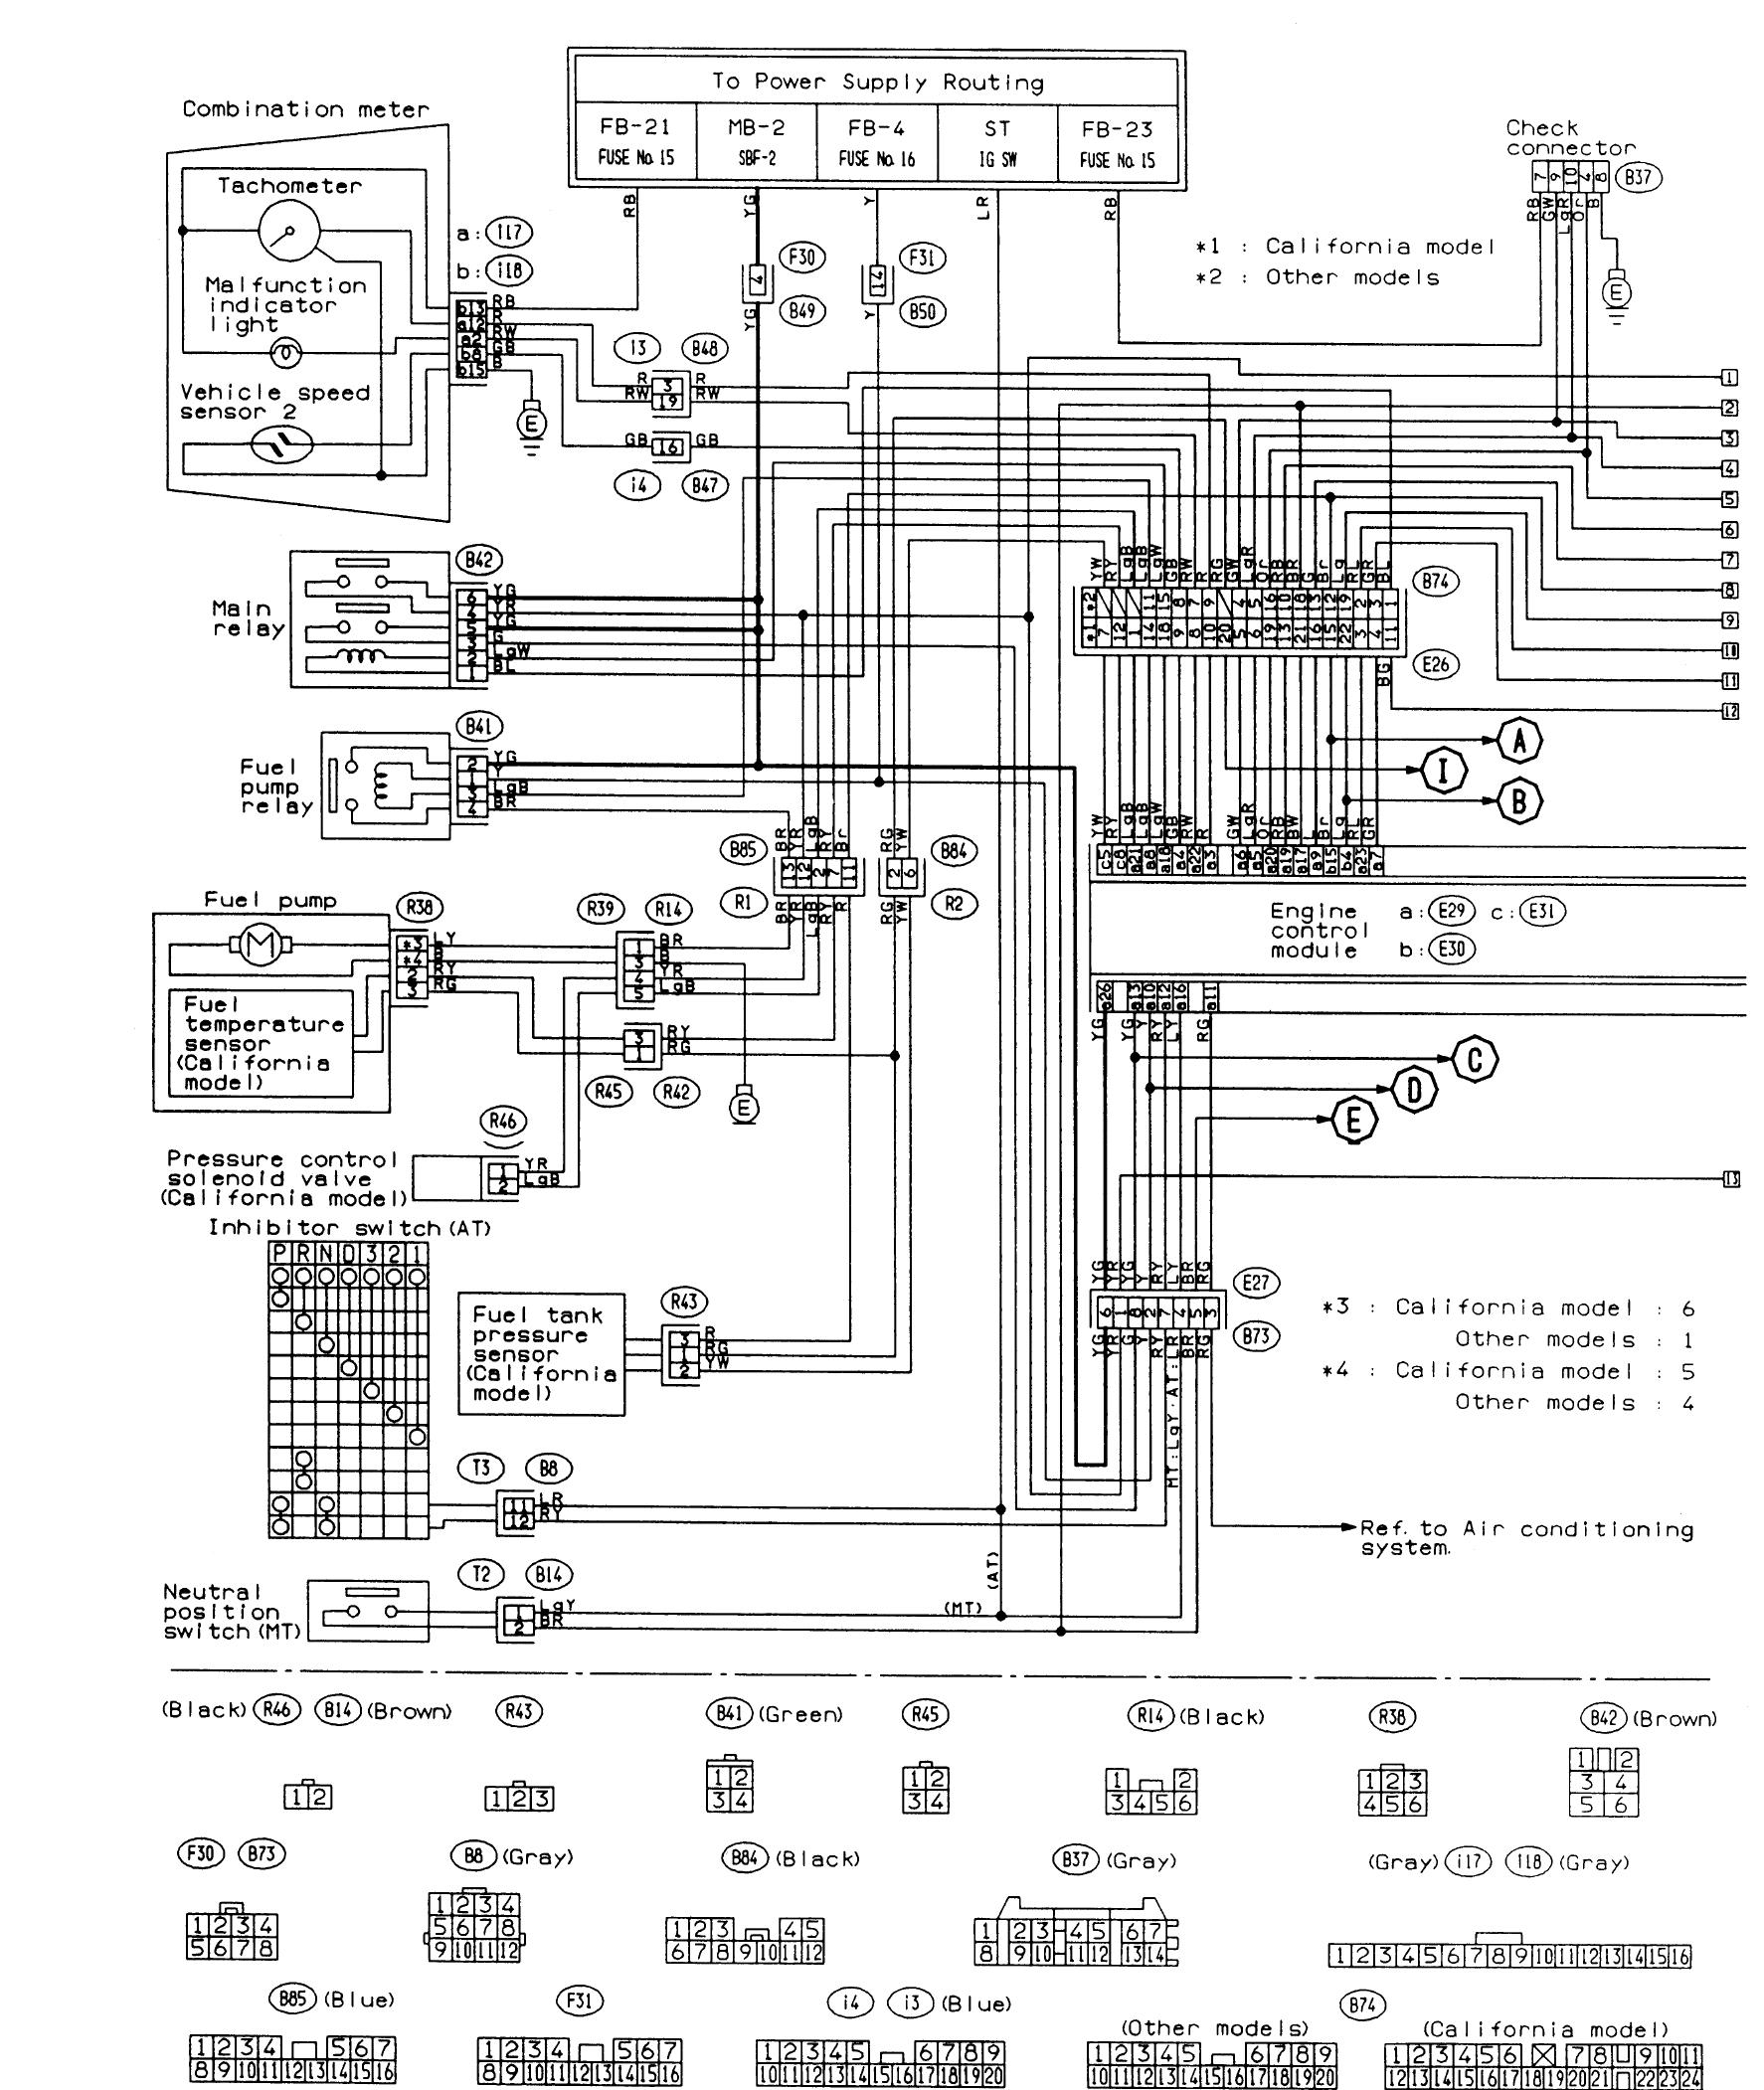 2005 subaru wrx wiring diagram - wiring diagram schematic 2003 subaru wrx wiring diagram subaru wiring harness diagram 12mr anitra